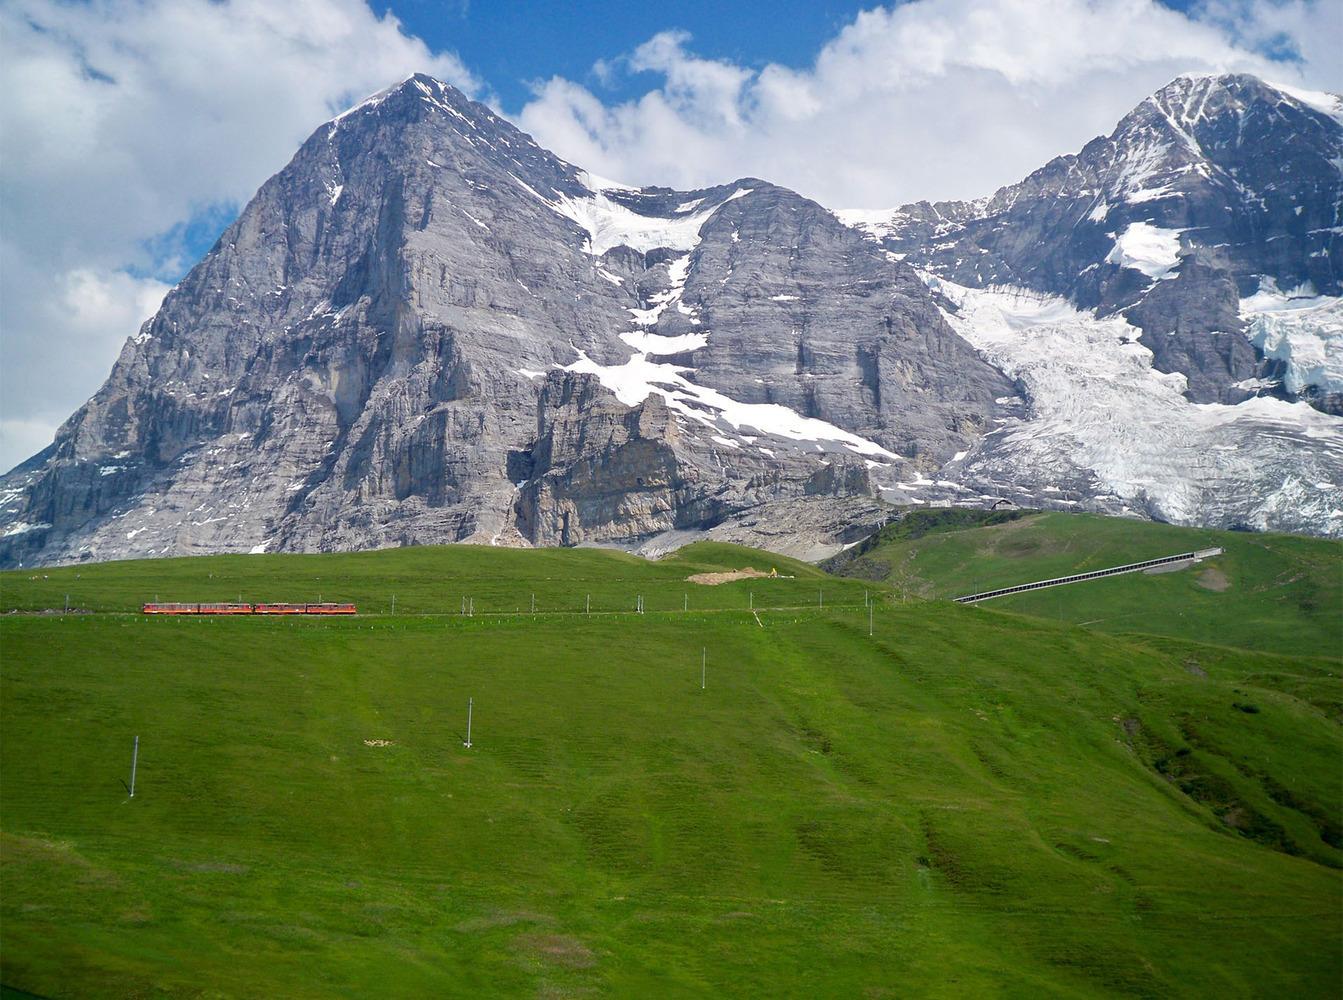 Switzerland Jungfrau train by Samantha Reid